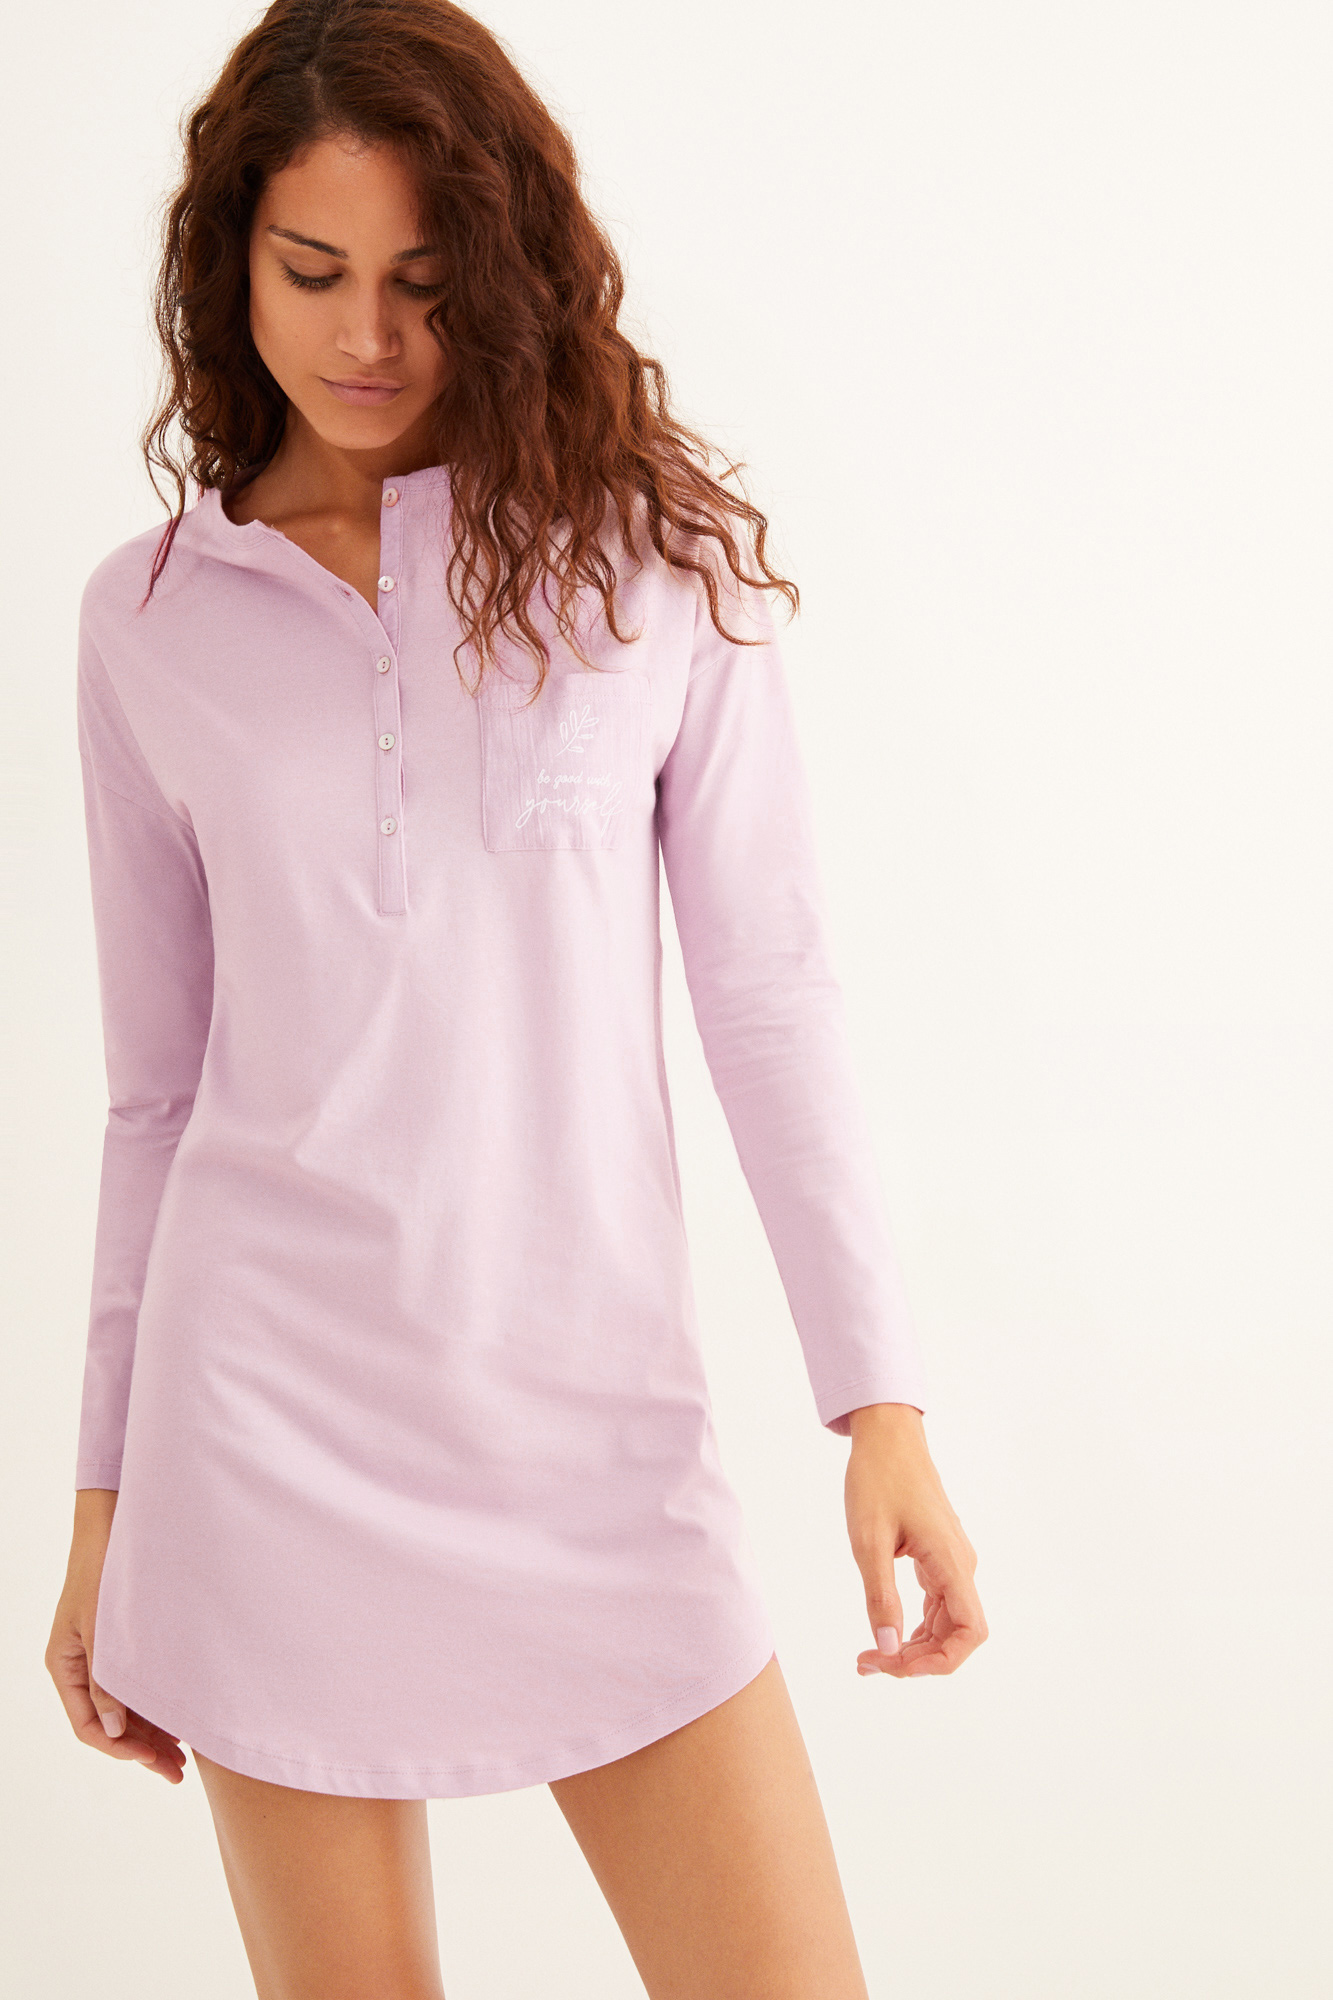 Camisón corto rosa algodón orgánico